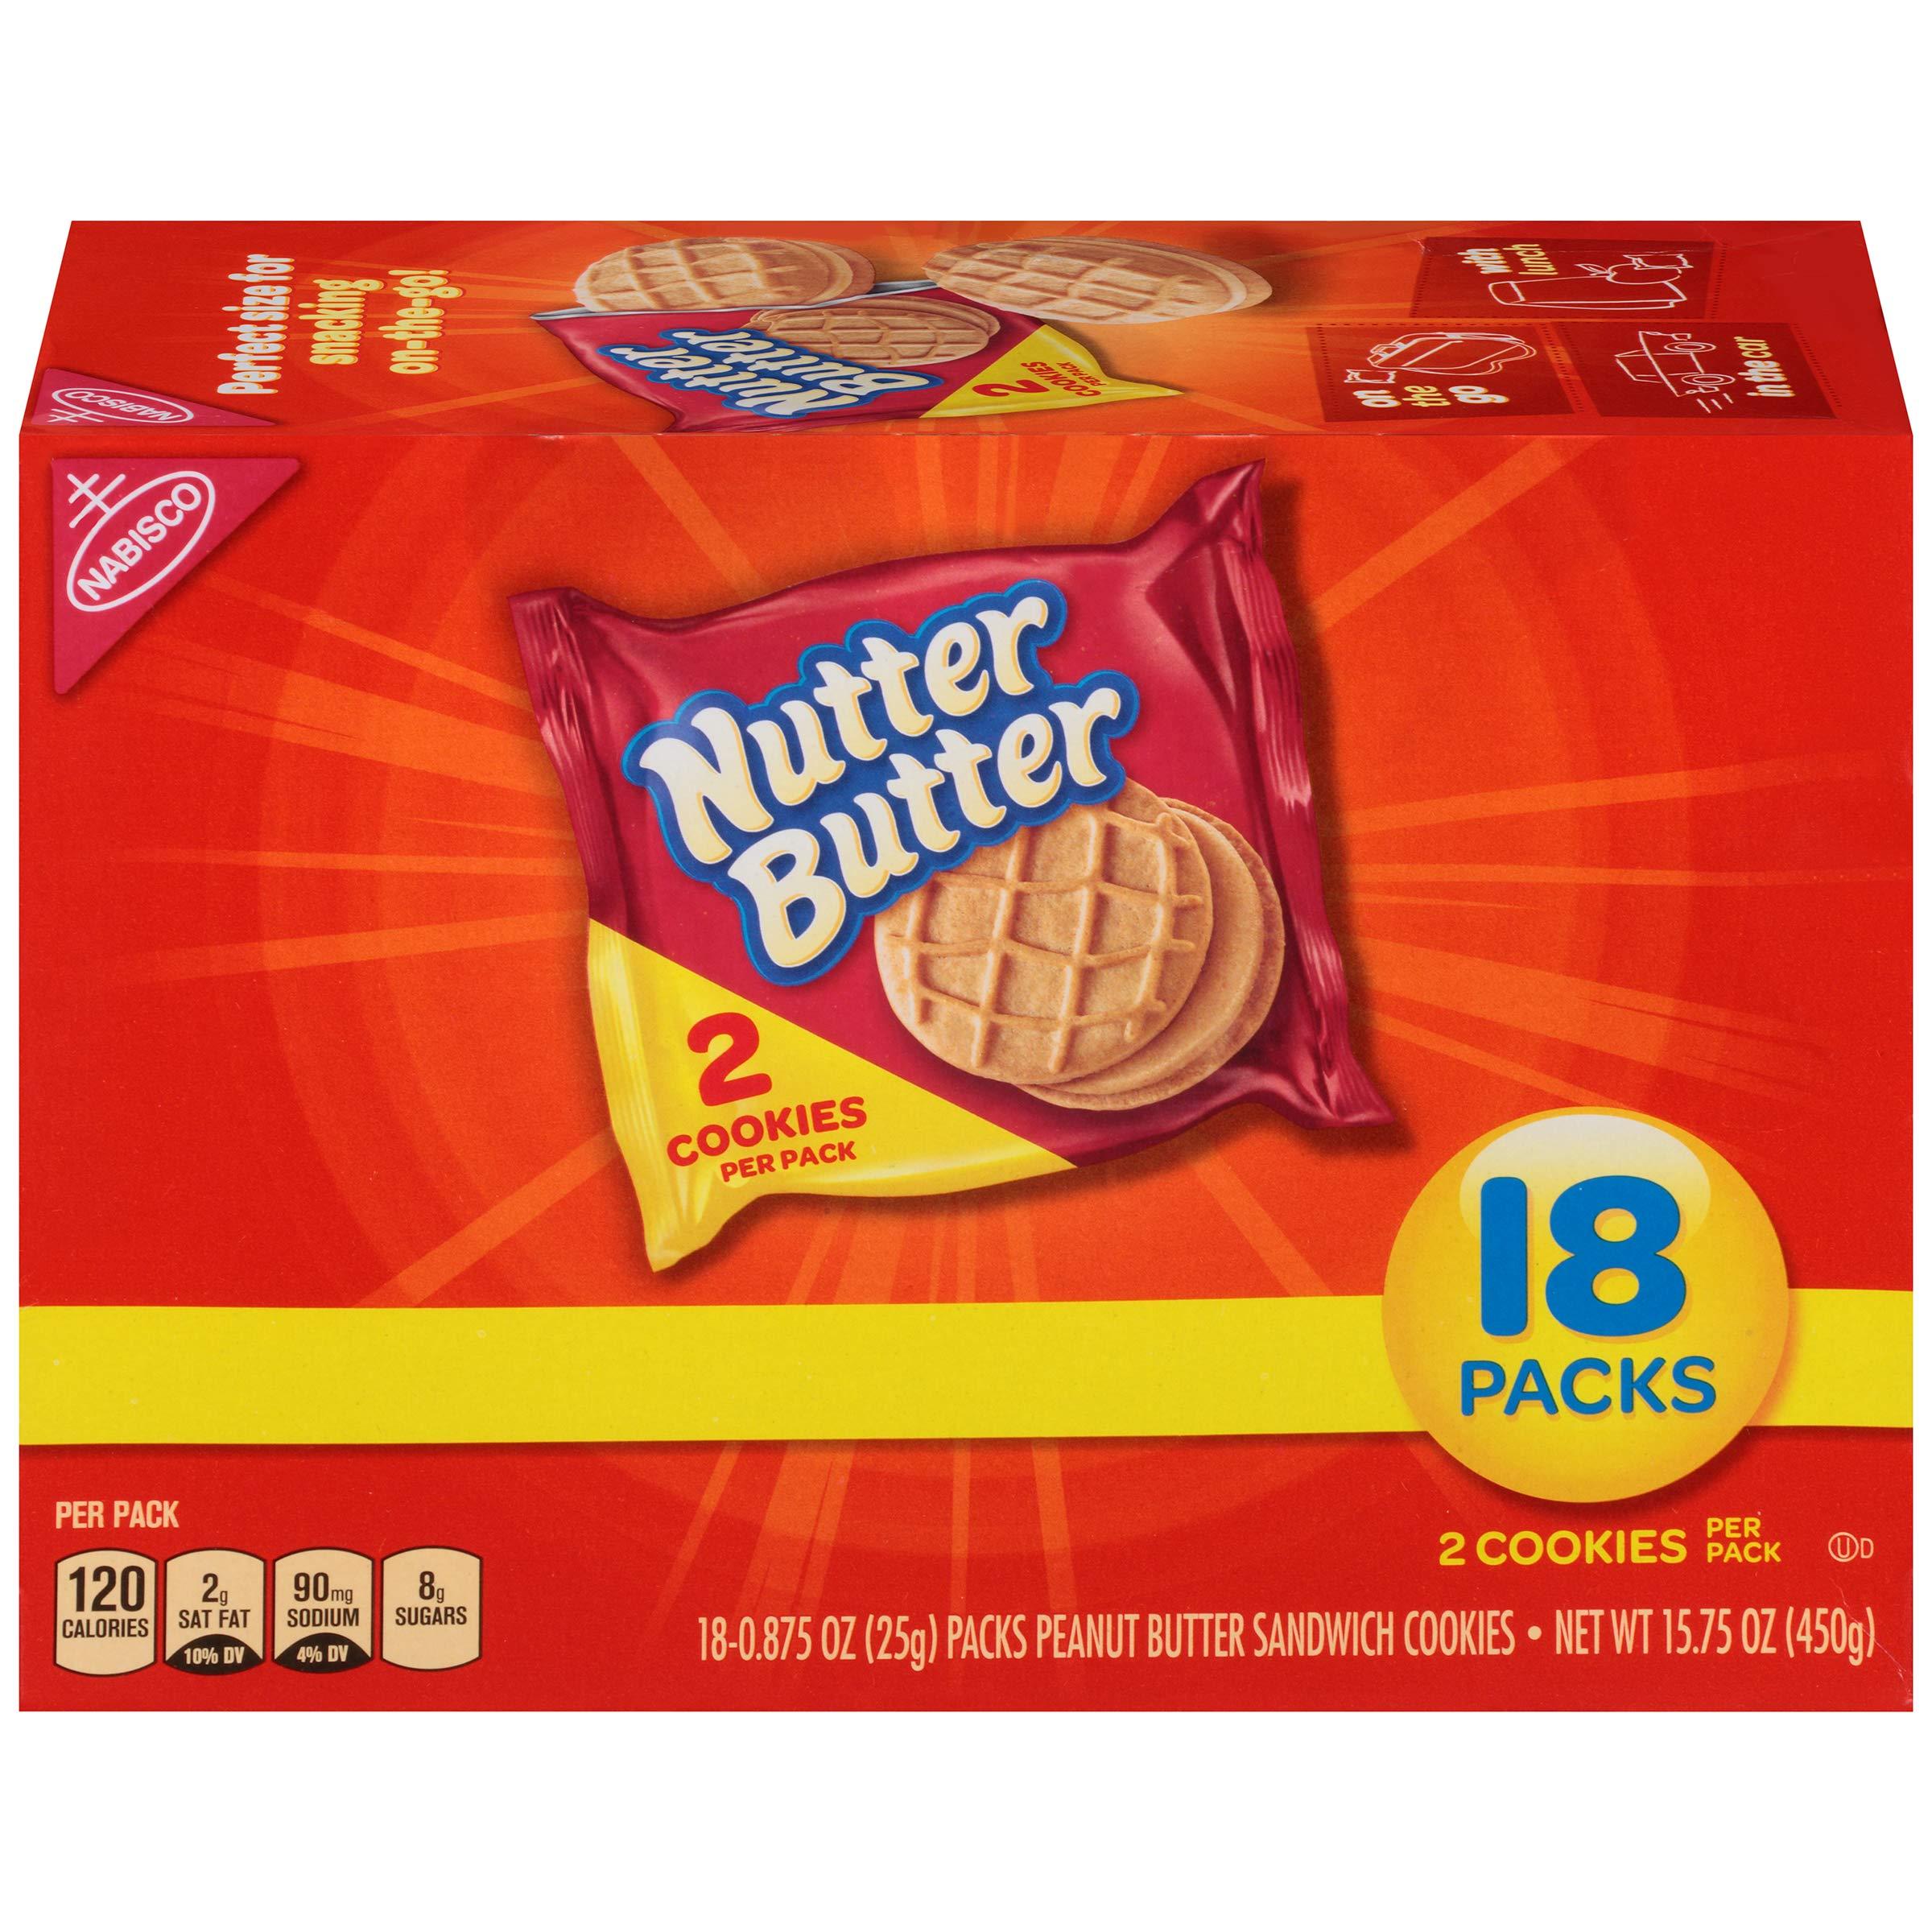 Nutter Butter Peanut Butter Sandwich Cookies - Snack Packs, 18 Count Box, 15.75 Ounce by Nutter Butter